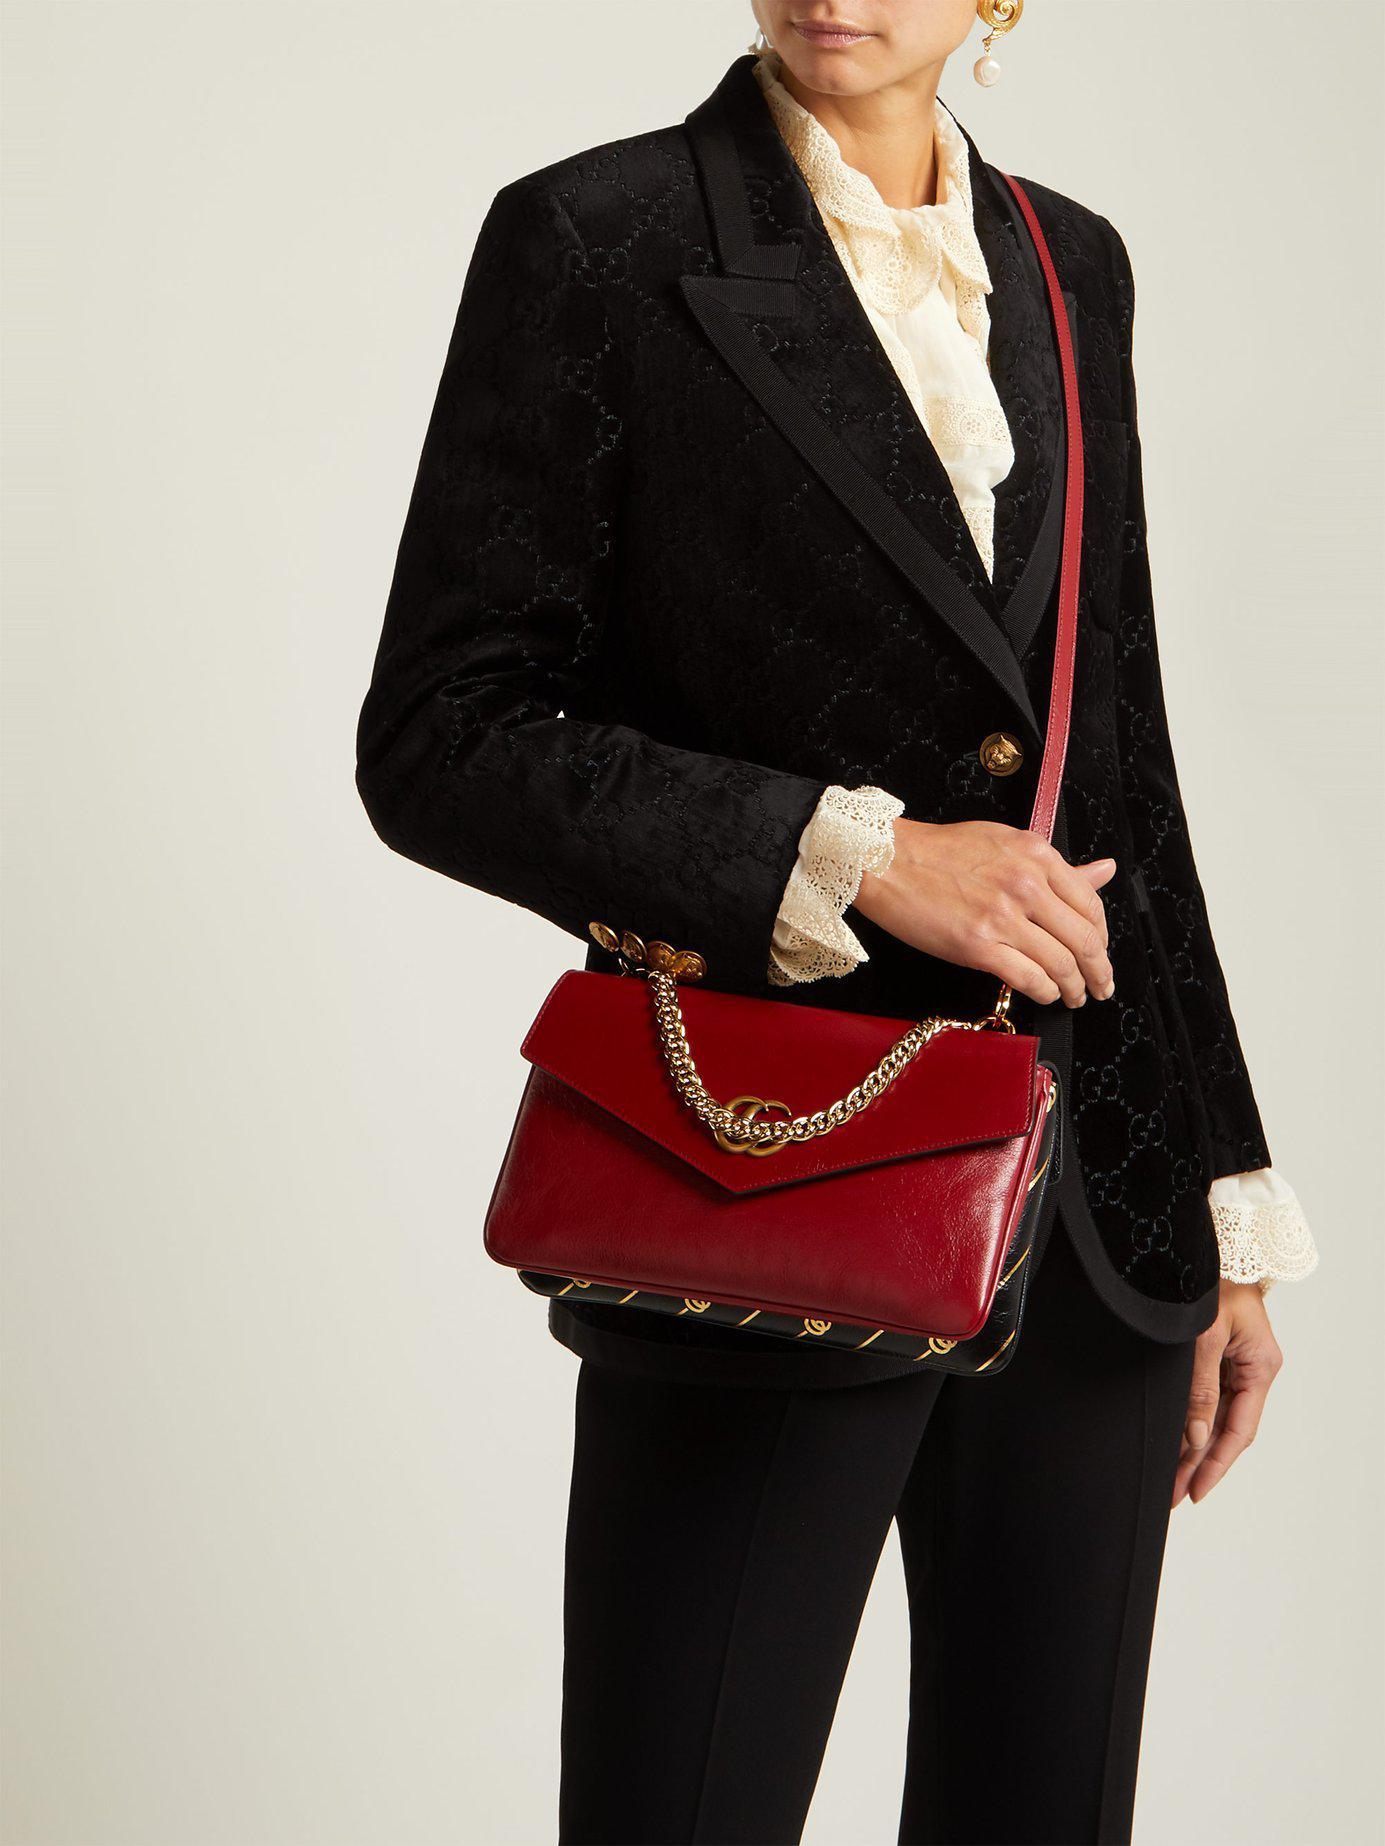 7351f636a41f Lyst - Gucci Thiara Gg Leather Shoulder Bag in Red